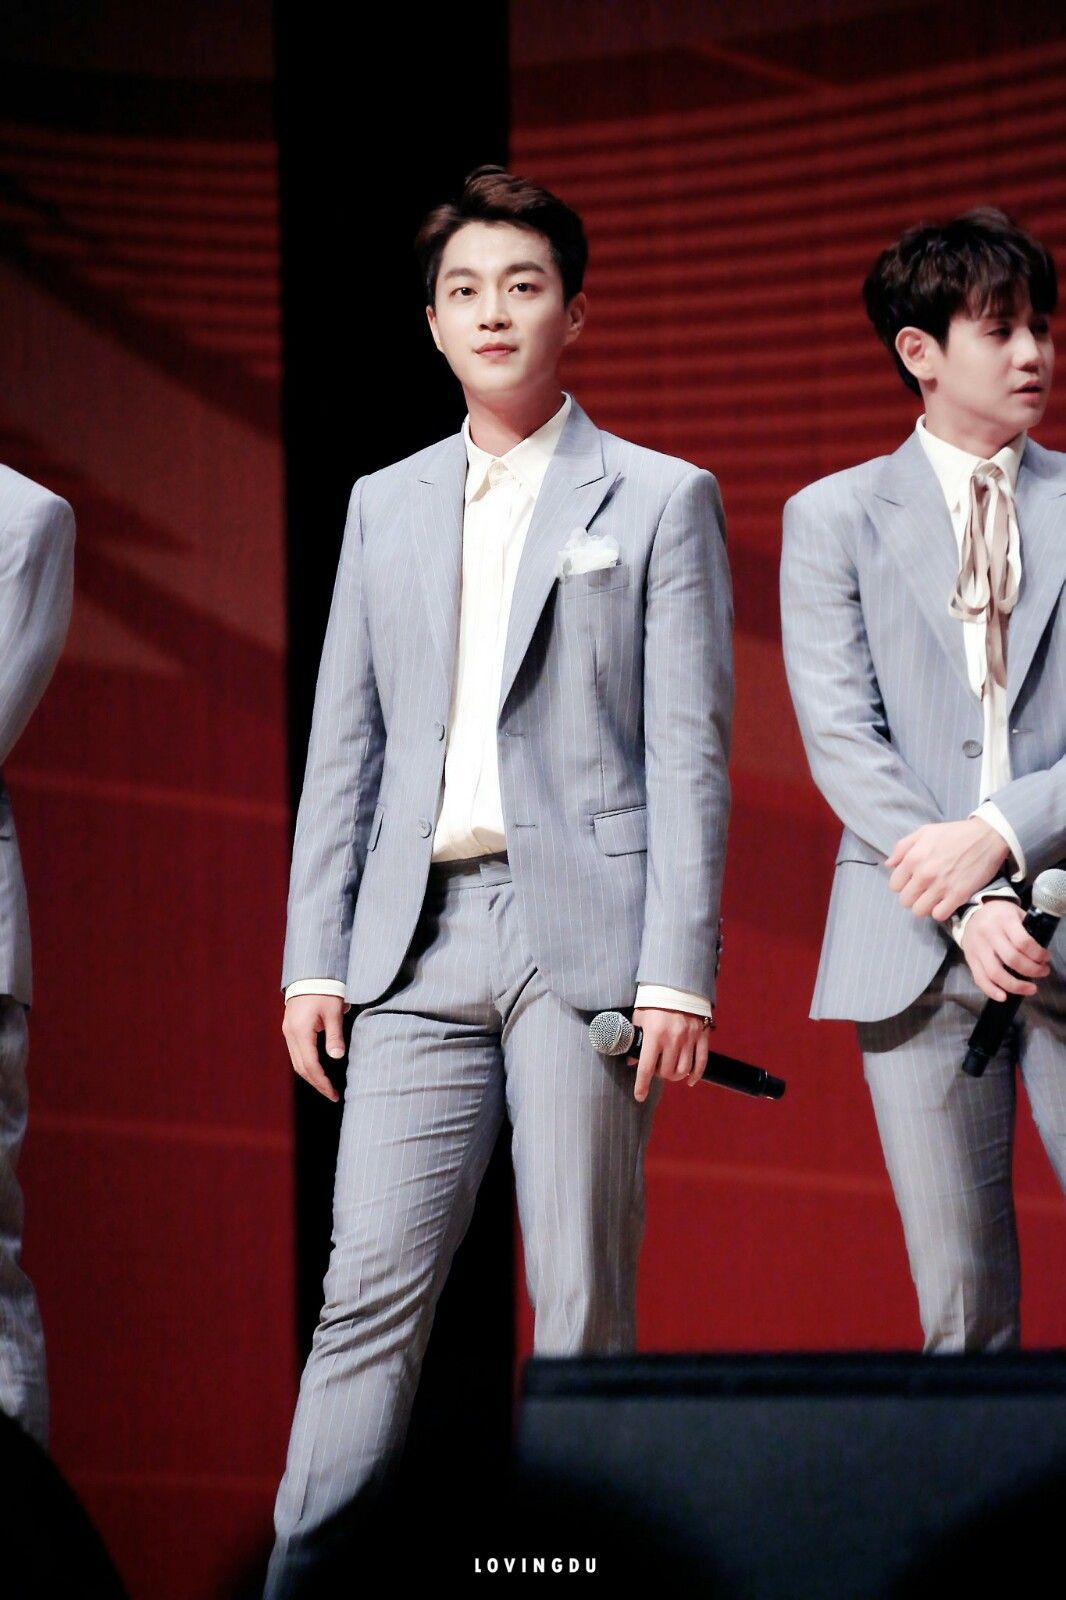 Dujun Yoseop - Beast 161103 | Kyunghee University's Music Festival